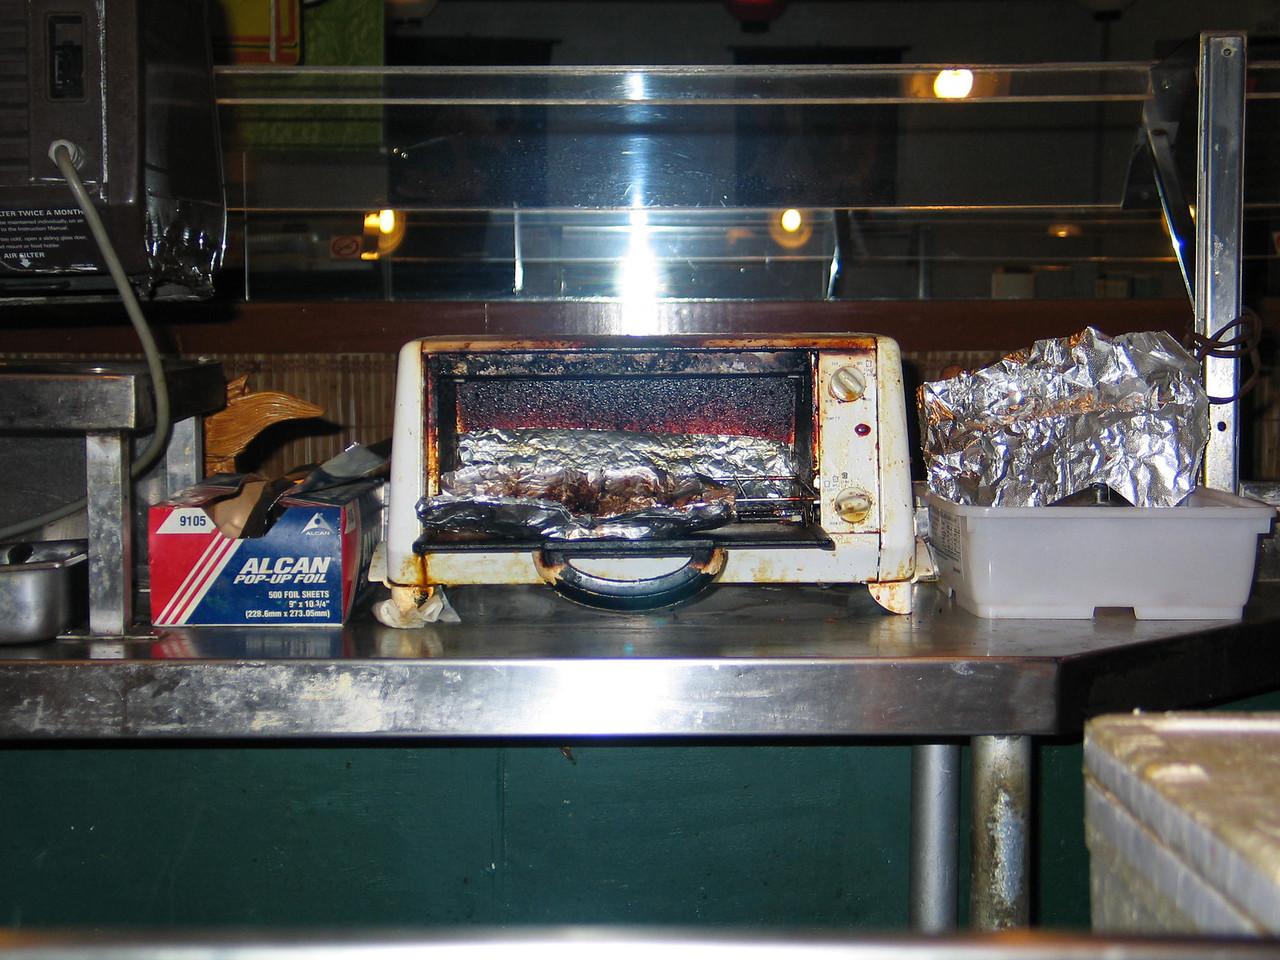 Ah, this is where the Salmon Skin Sashimi cooks, where's the smoke signal;-)